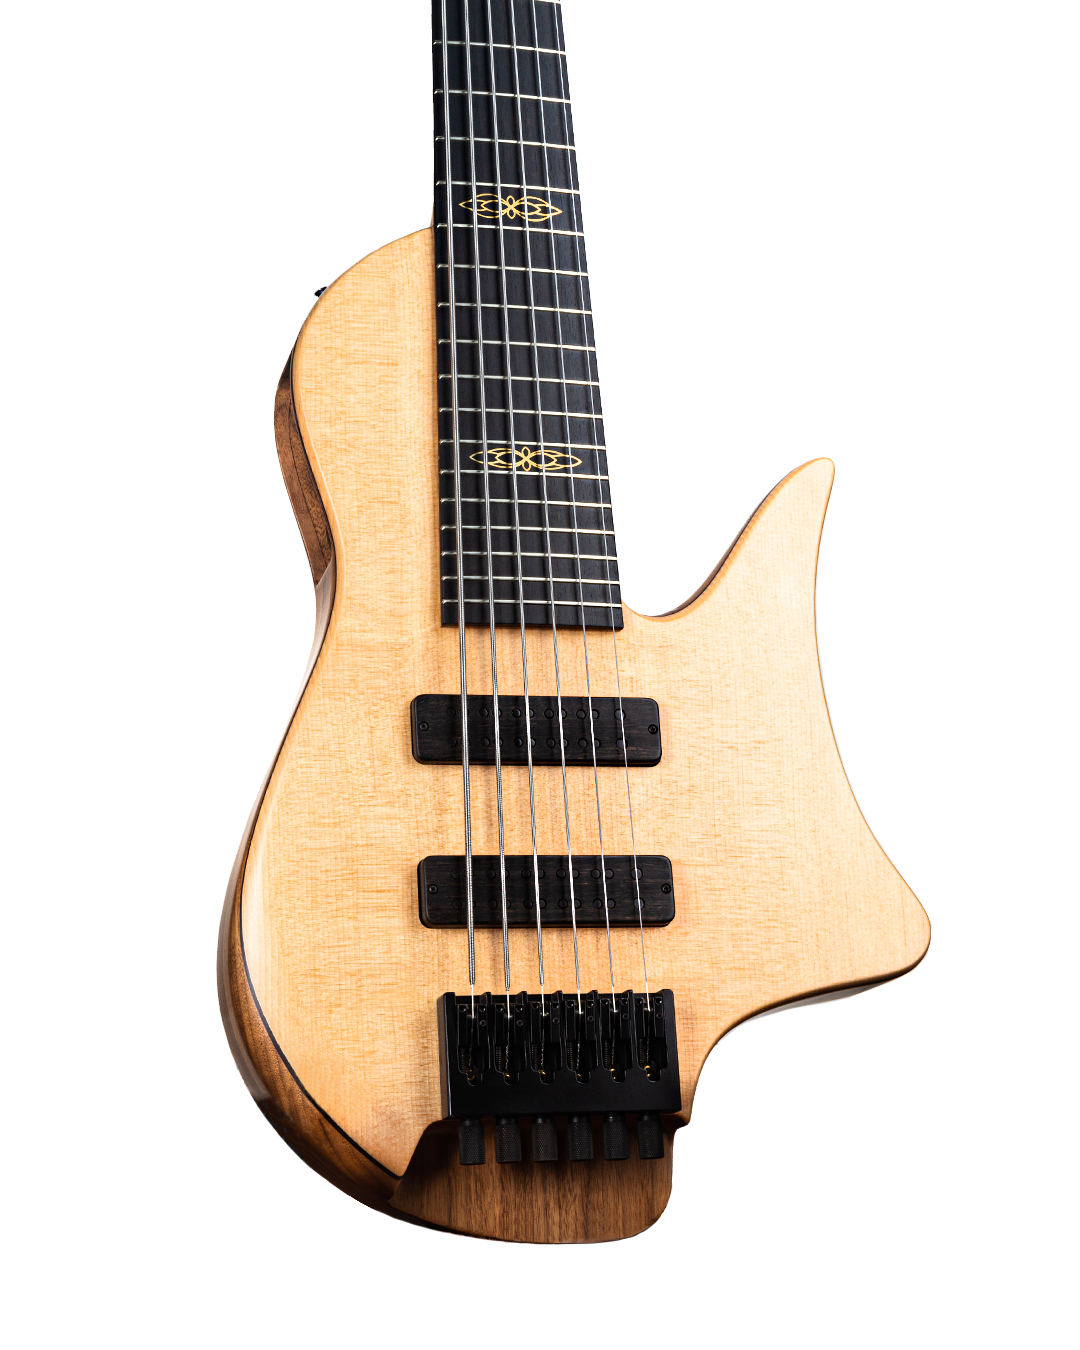 Masterbuilt Crescent Bass Guitar Front Body From Below